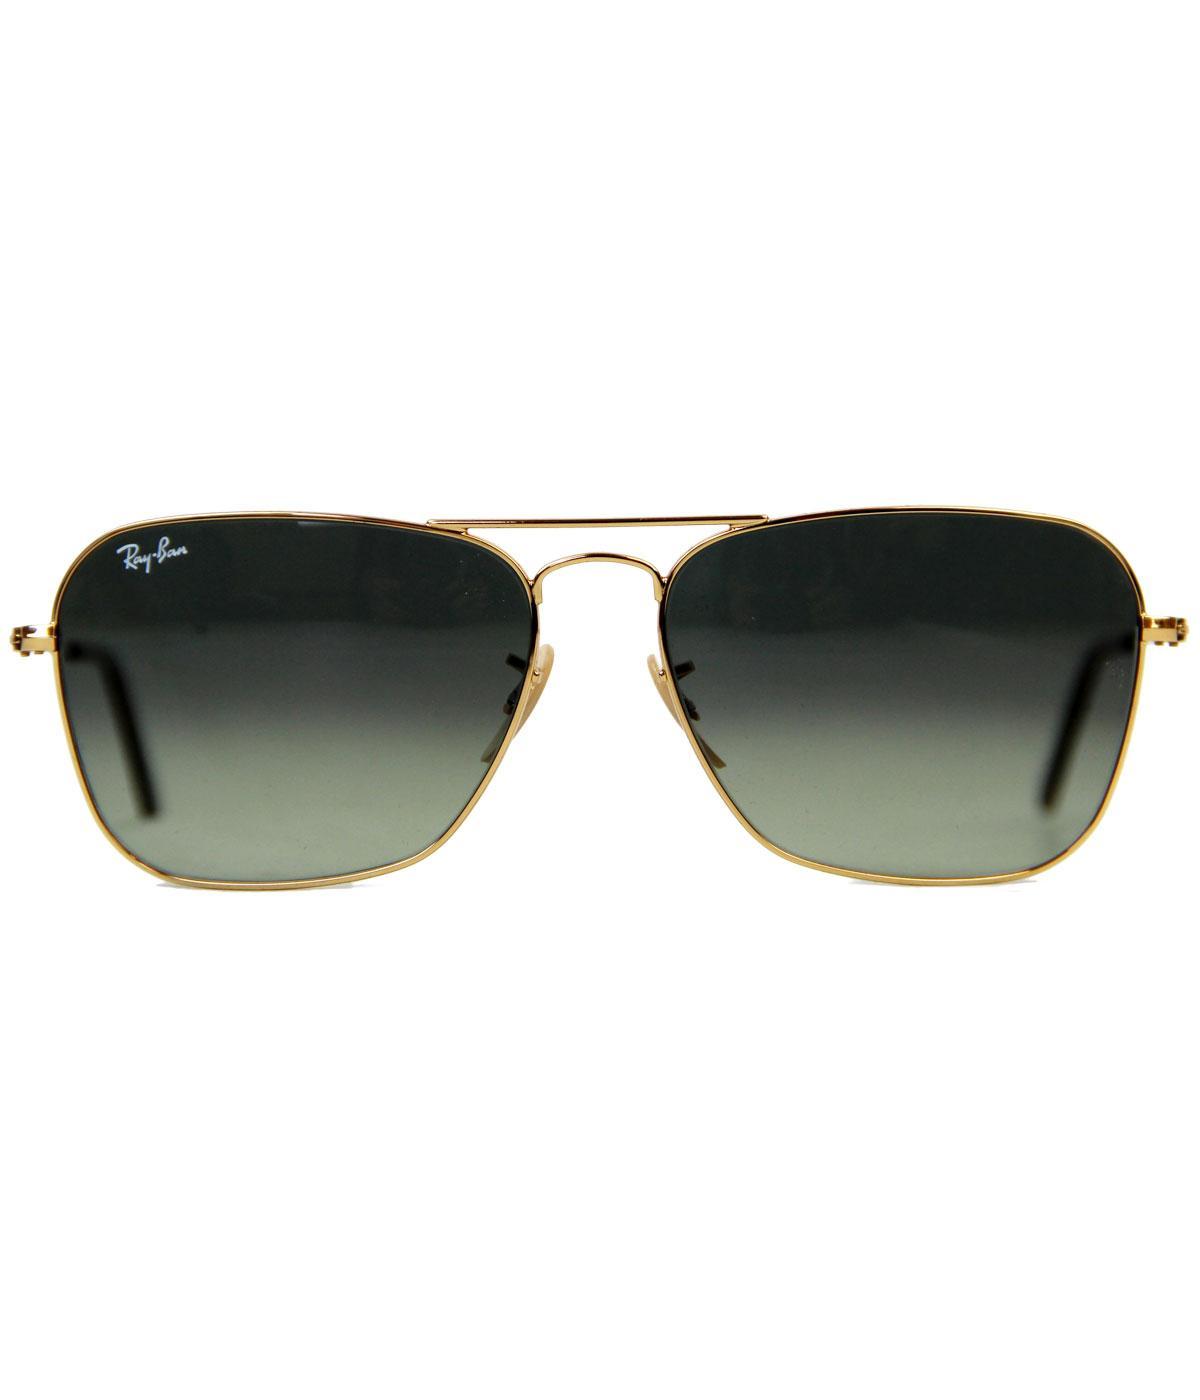 Ray-Ban Caravan Retro 60s Mod Sunglasses in Gold Grey 0RB3136